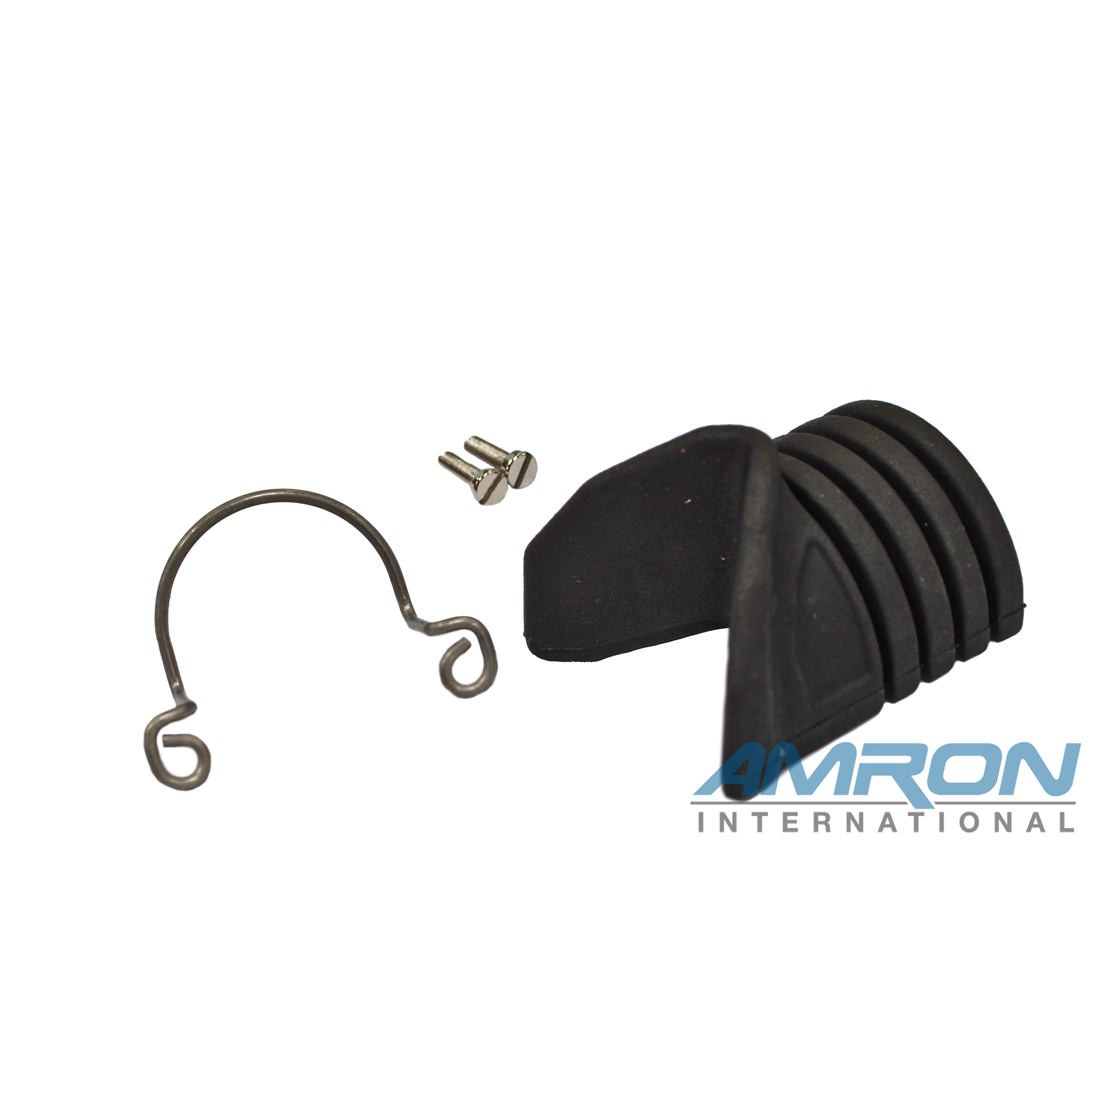 Interspiro AGA 336-190-373 Pressure Equalizer